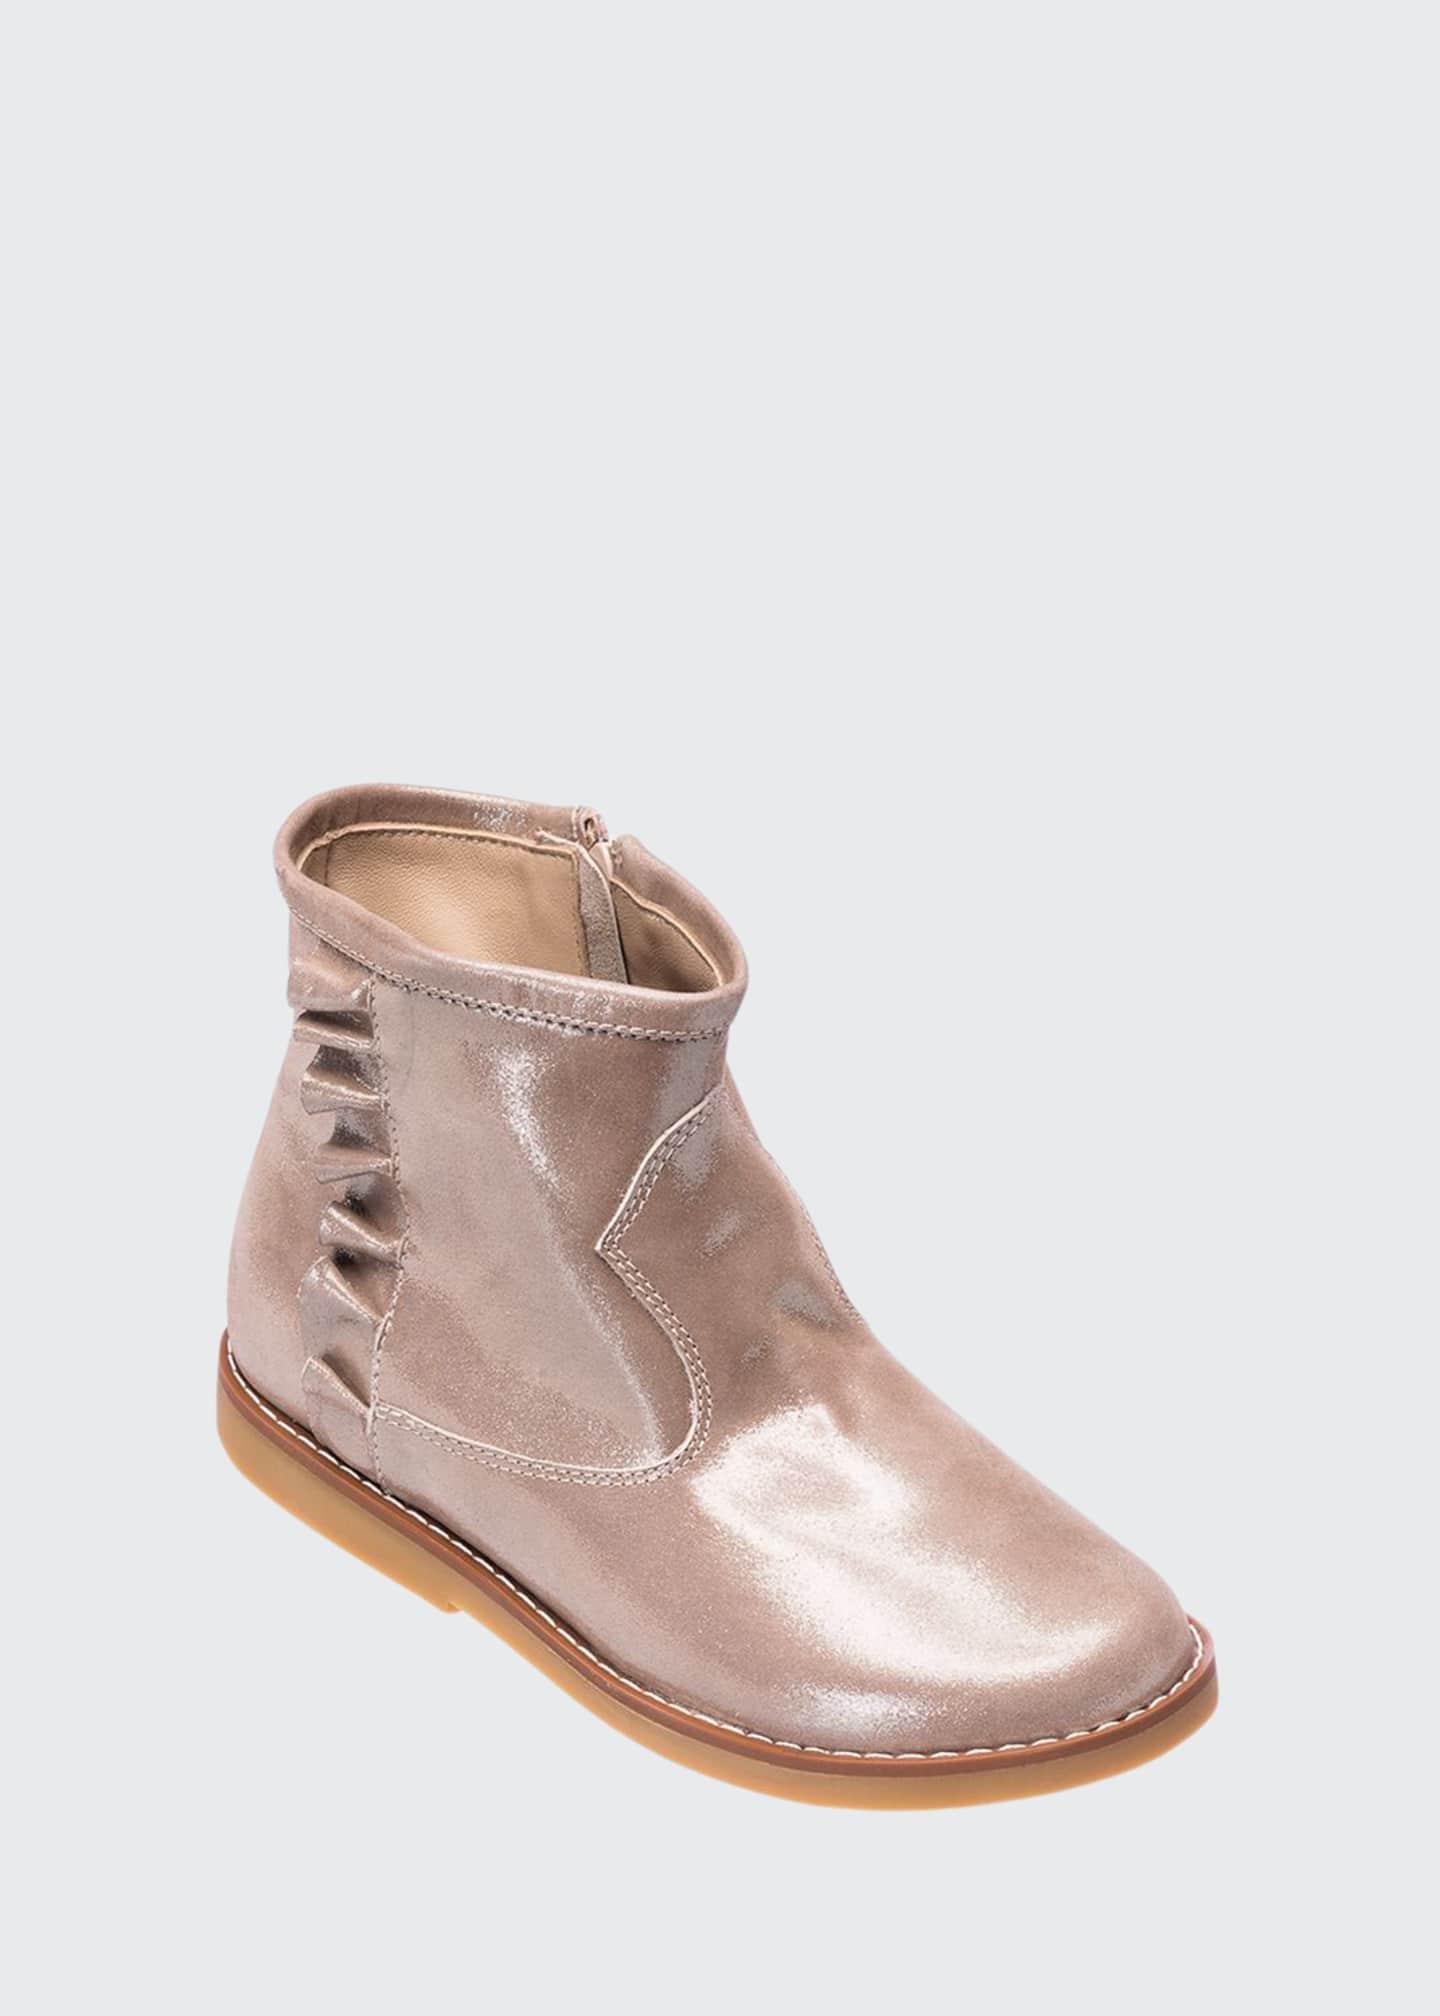 Elephantito Ruffle-Trim Metallic Leather Booties, Kids